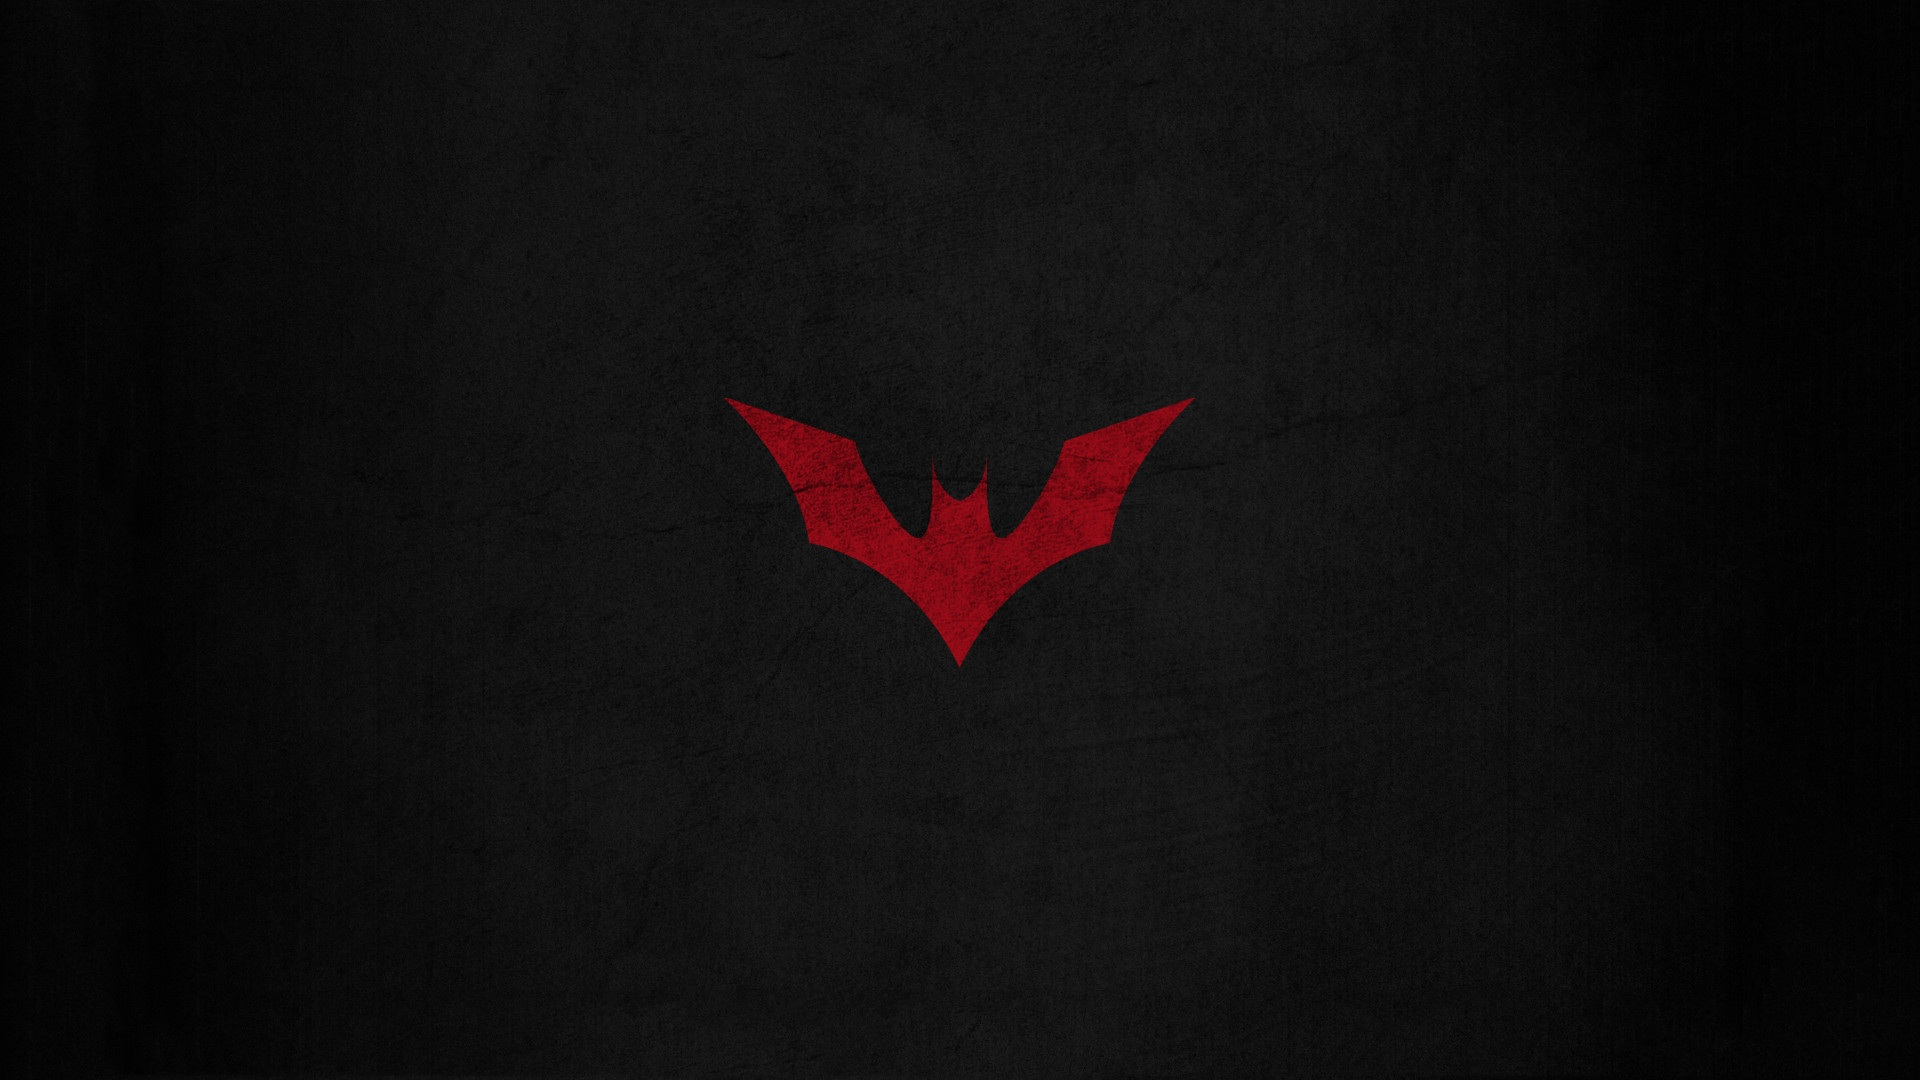 batman beyond full hd wallpaper and background 1920x1080